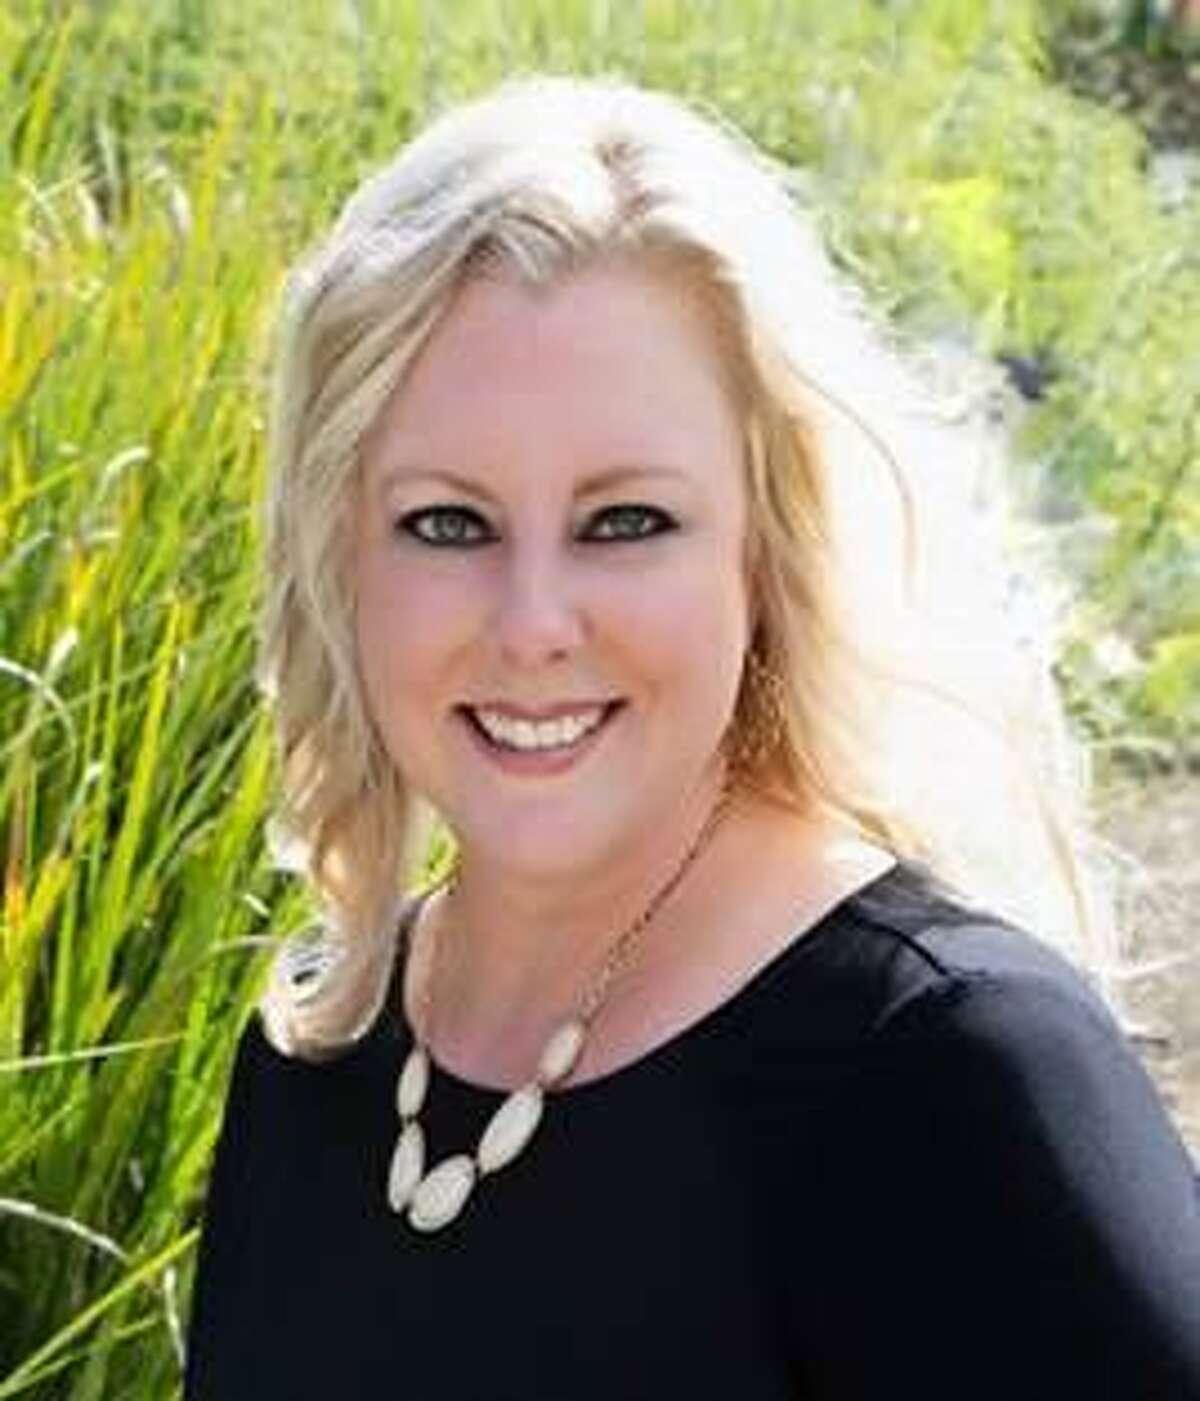 Kara Morgan has been named as principal of Bethke Elementary in Katy Independent School District.